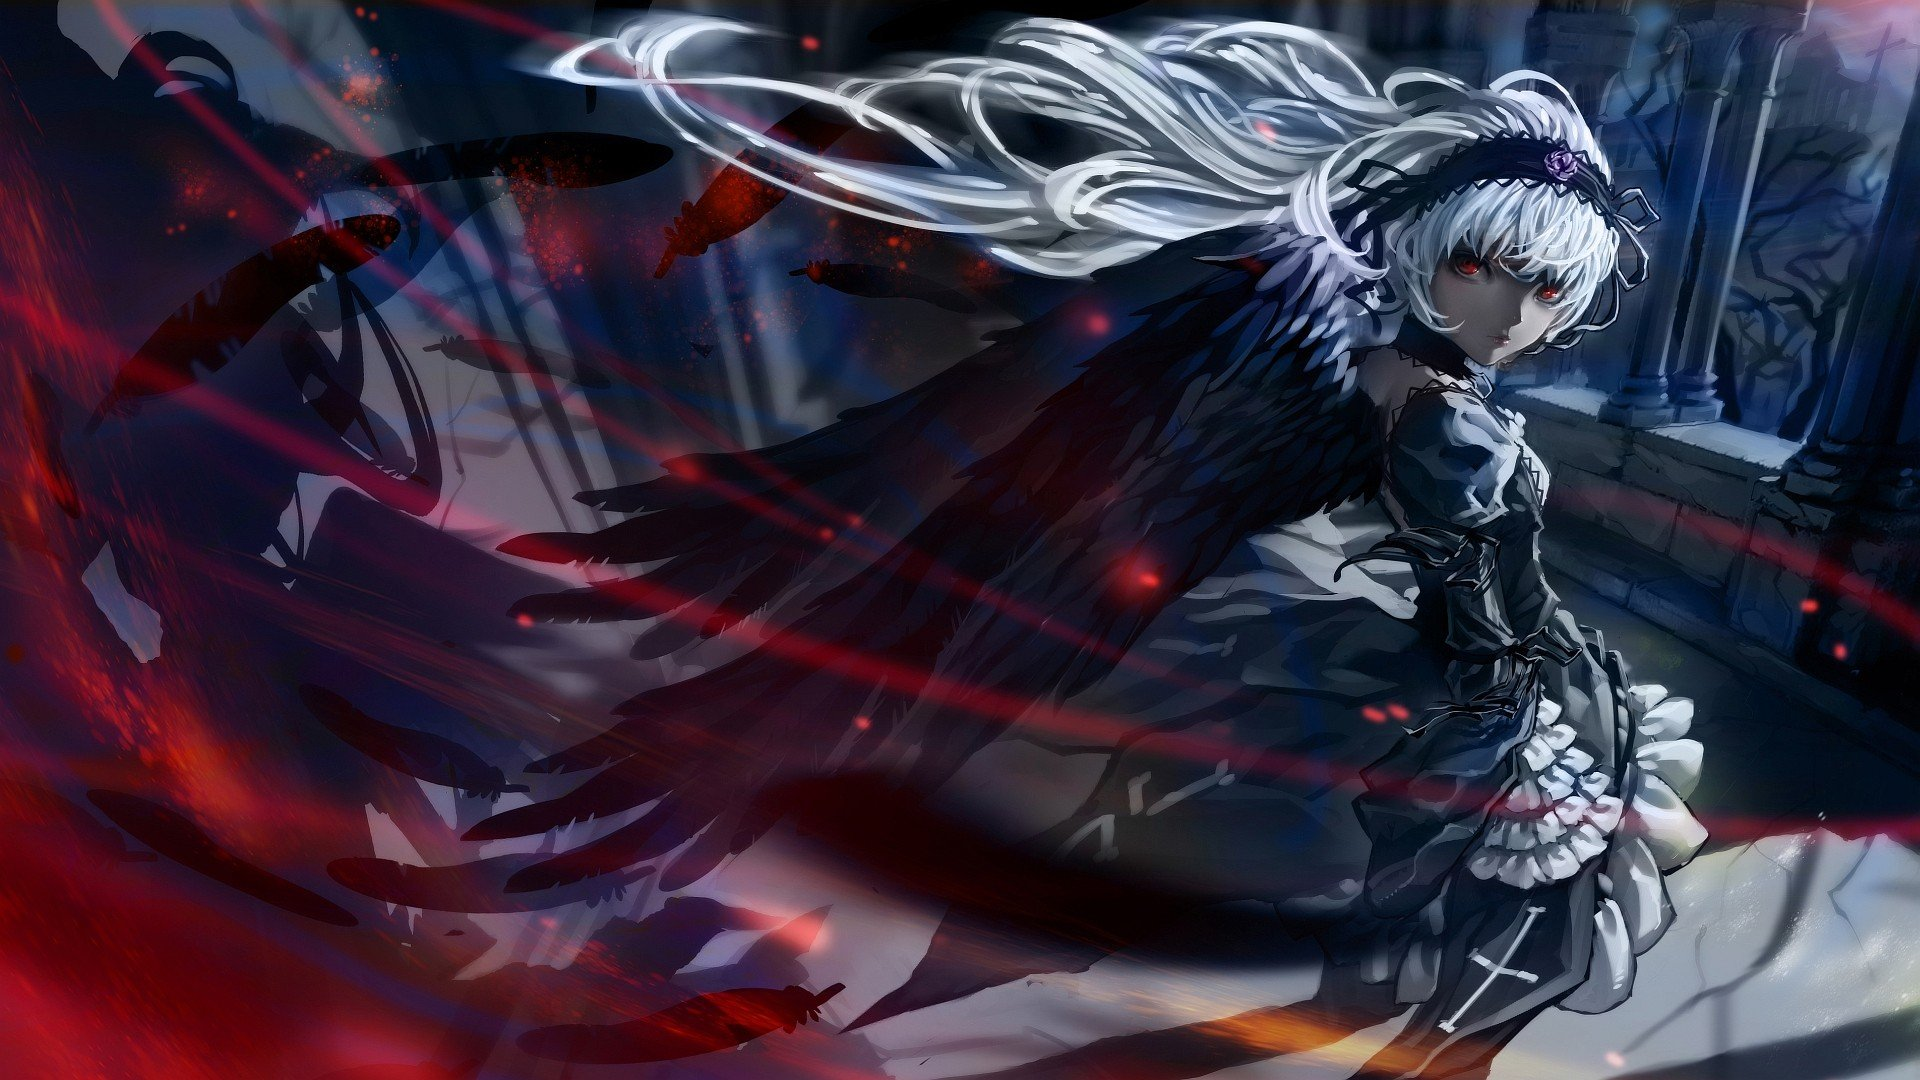 artwork, Fantasy art, Wings, White hair, Rozen Maiden, Suigintou Wallpaper